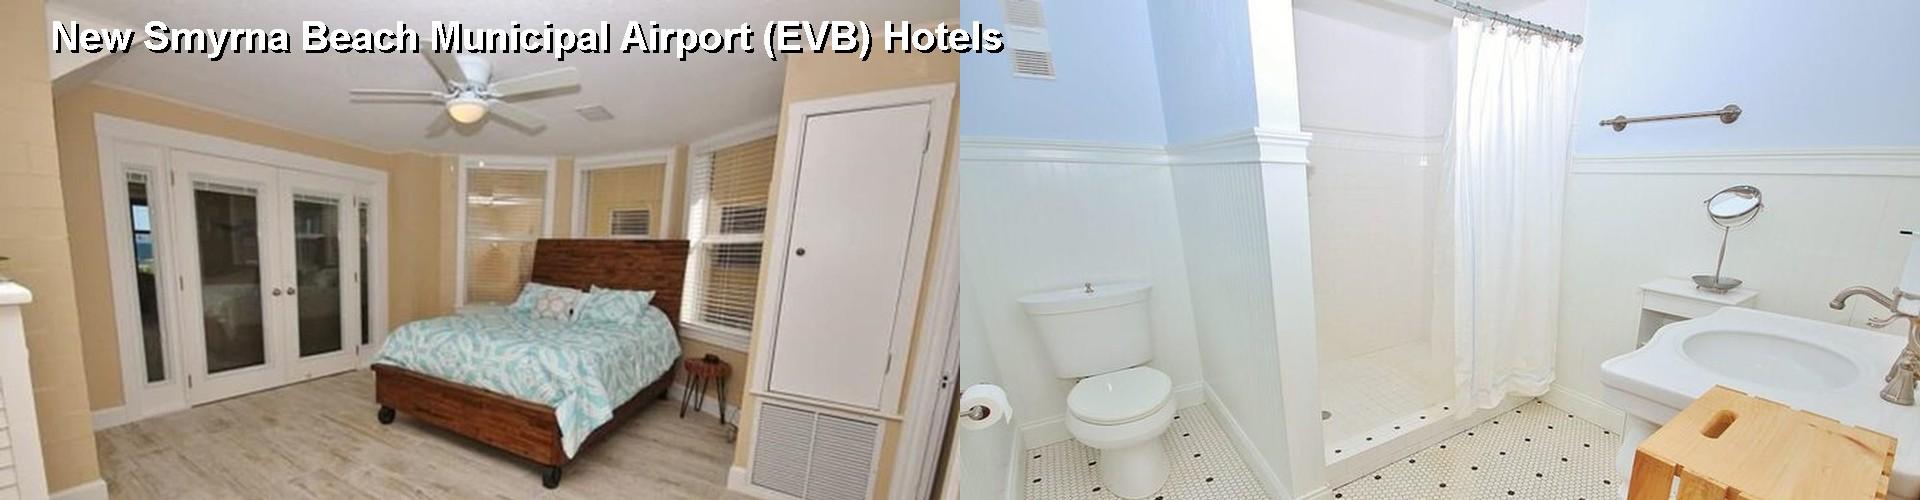 4 Best Hotels Near New Smyrna Beach Munil Airport Evb